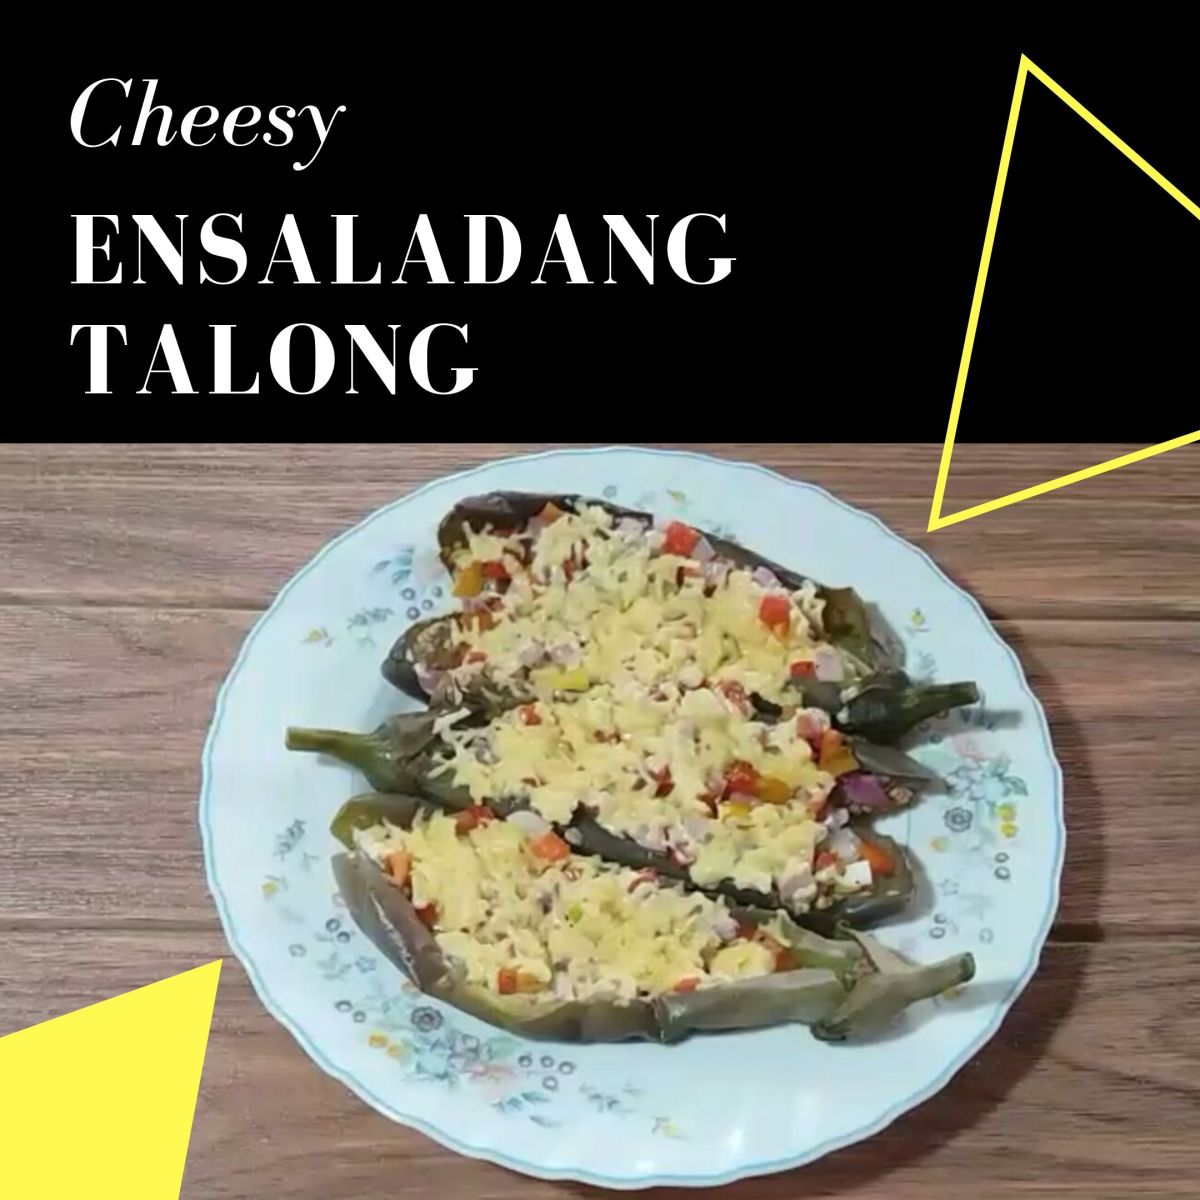 Cheesy ensaladang talong (eggplant salad)